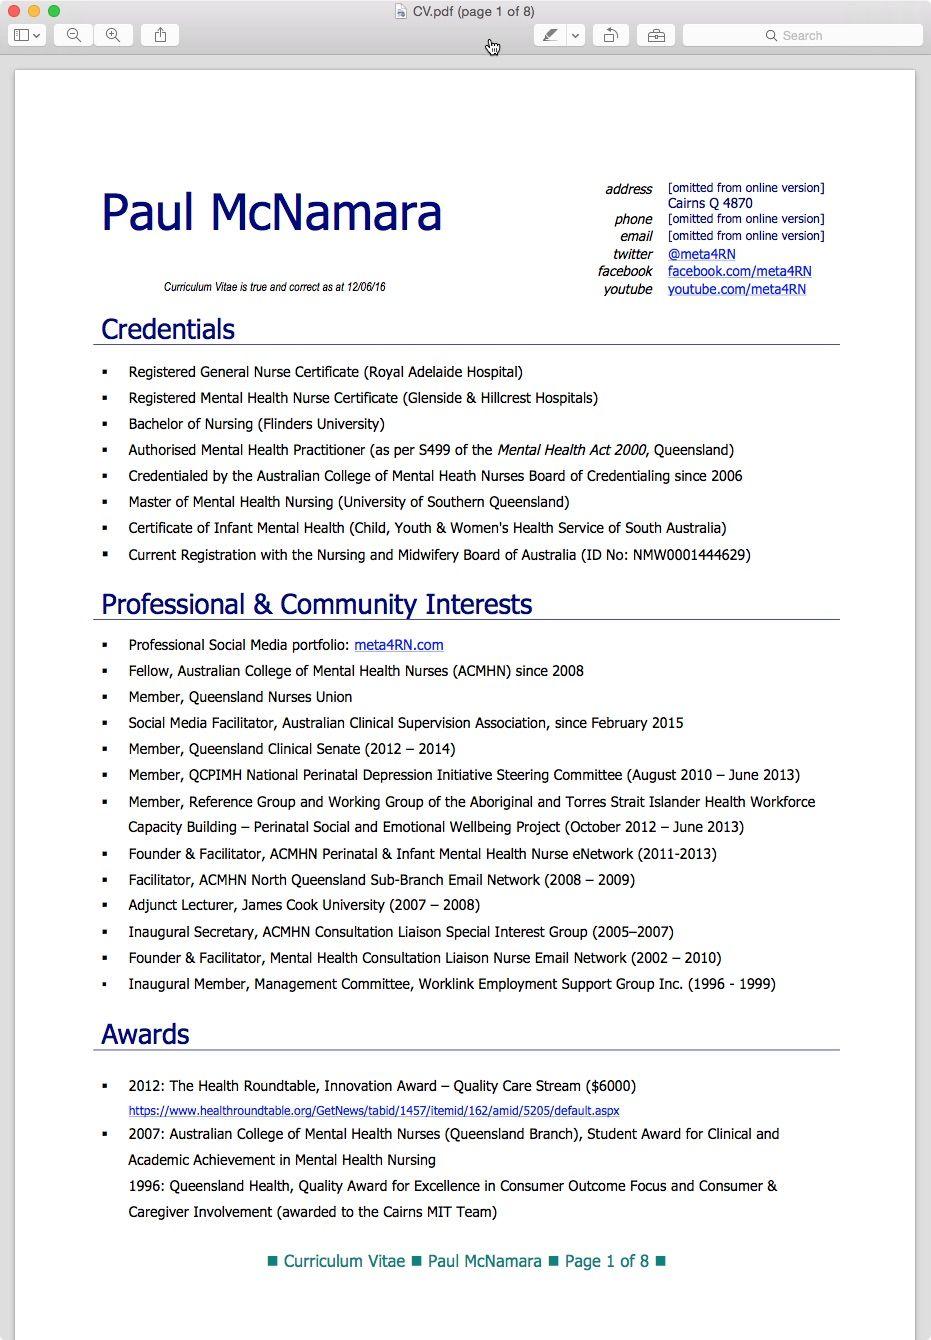 Cv Template Queensland Health Cv template, Resume